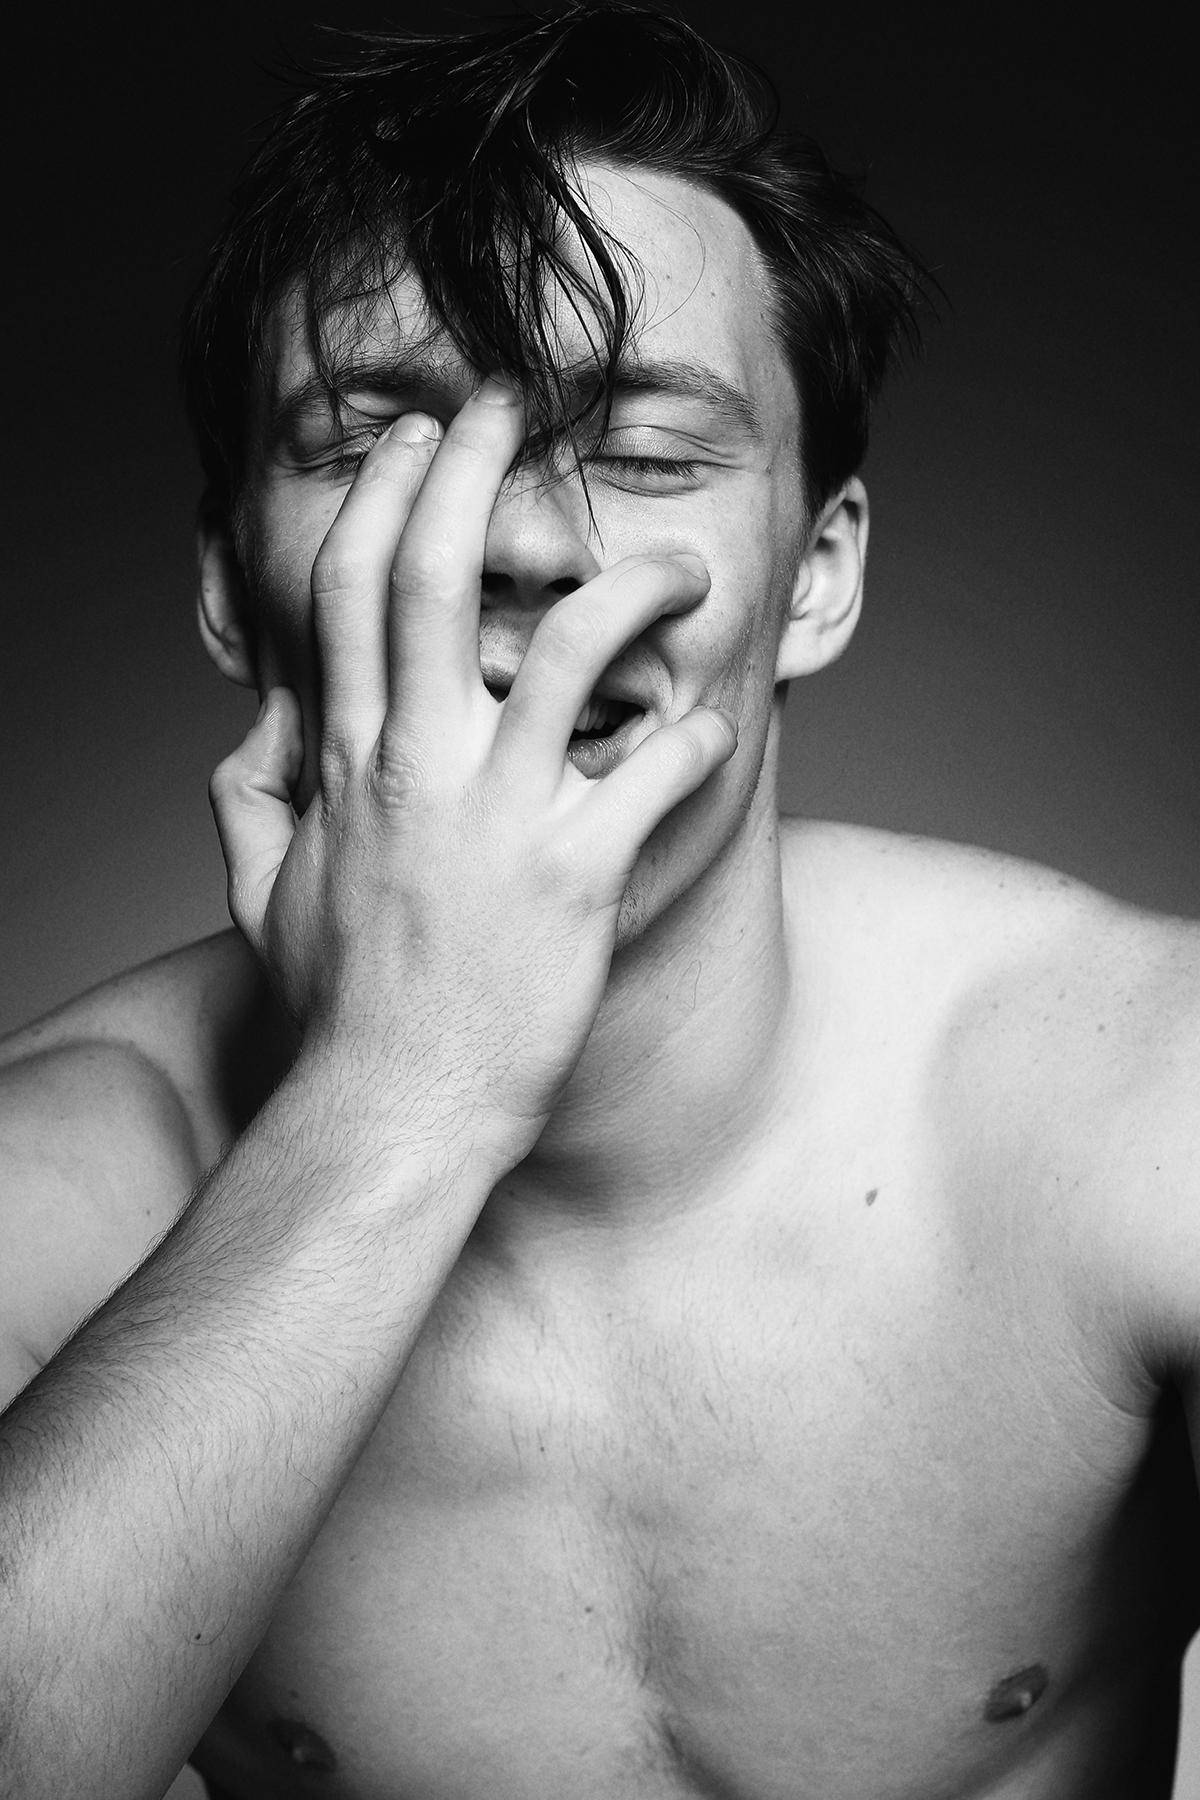 Adon Exclusive: Model John Mise By Migle Golubickaite